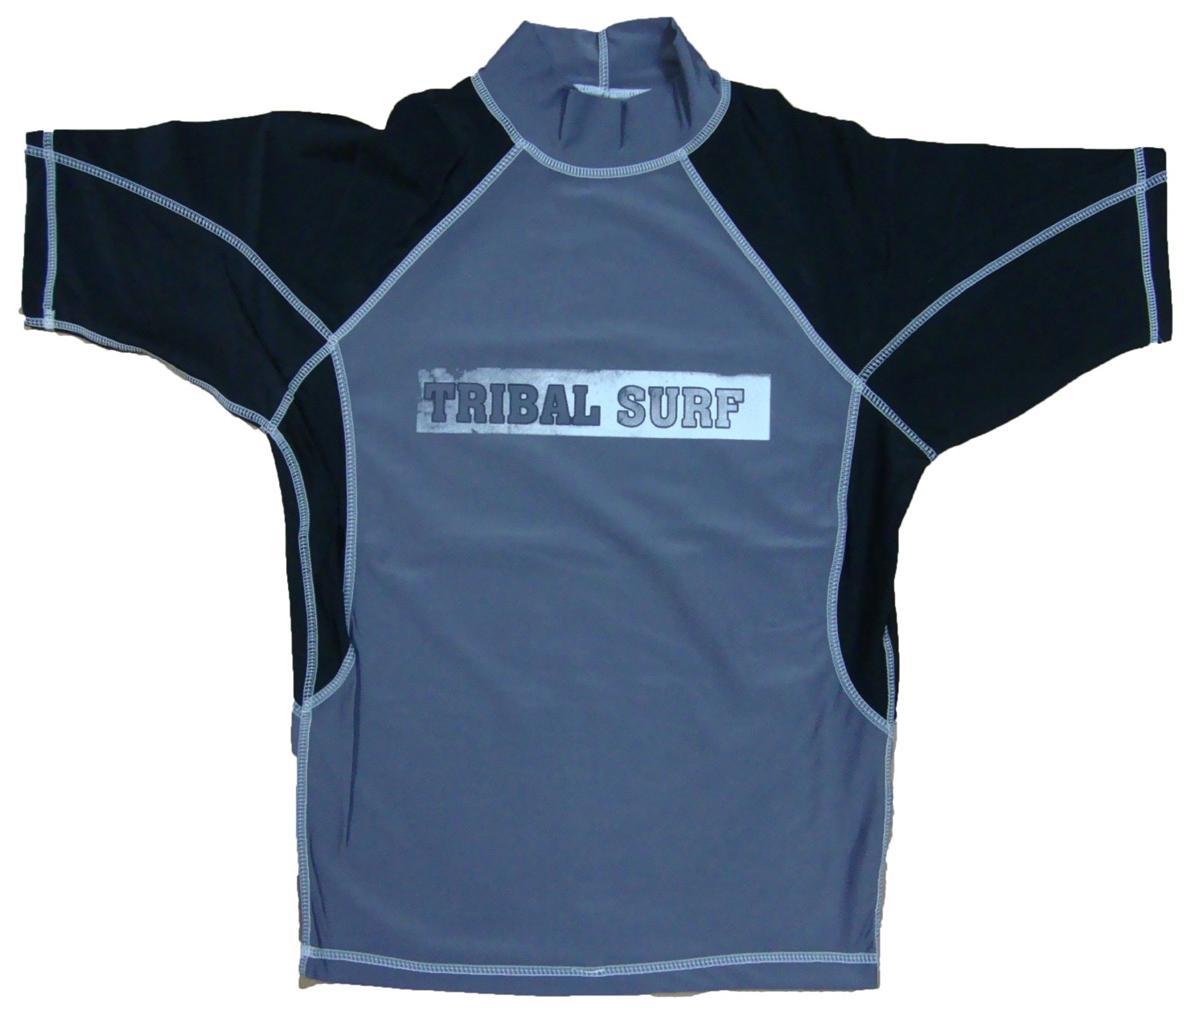 Mens Spf 50 Surf Shirt Rash Guard Short Sleeve Small Thru